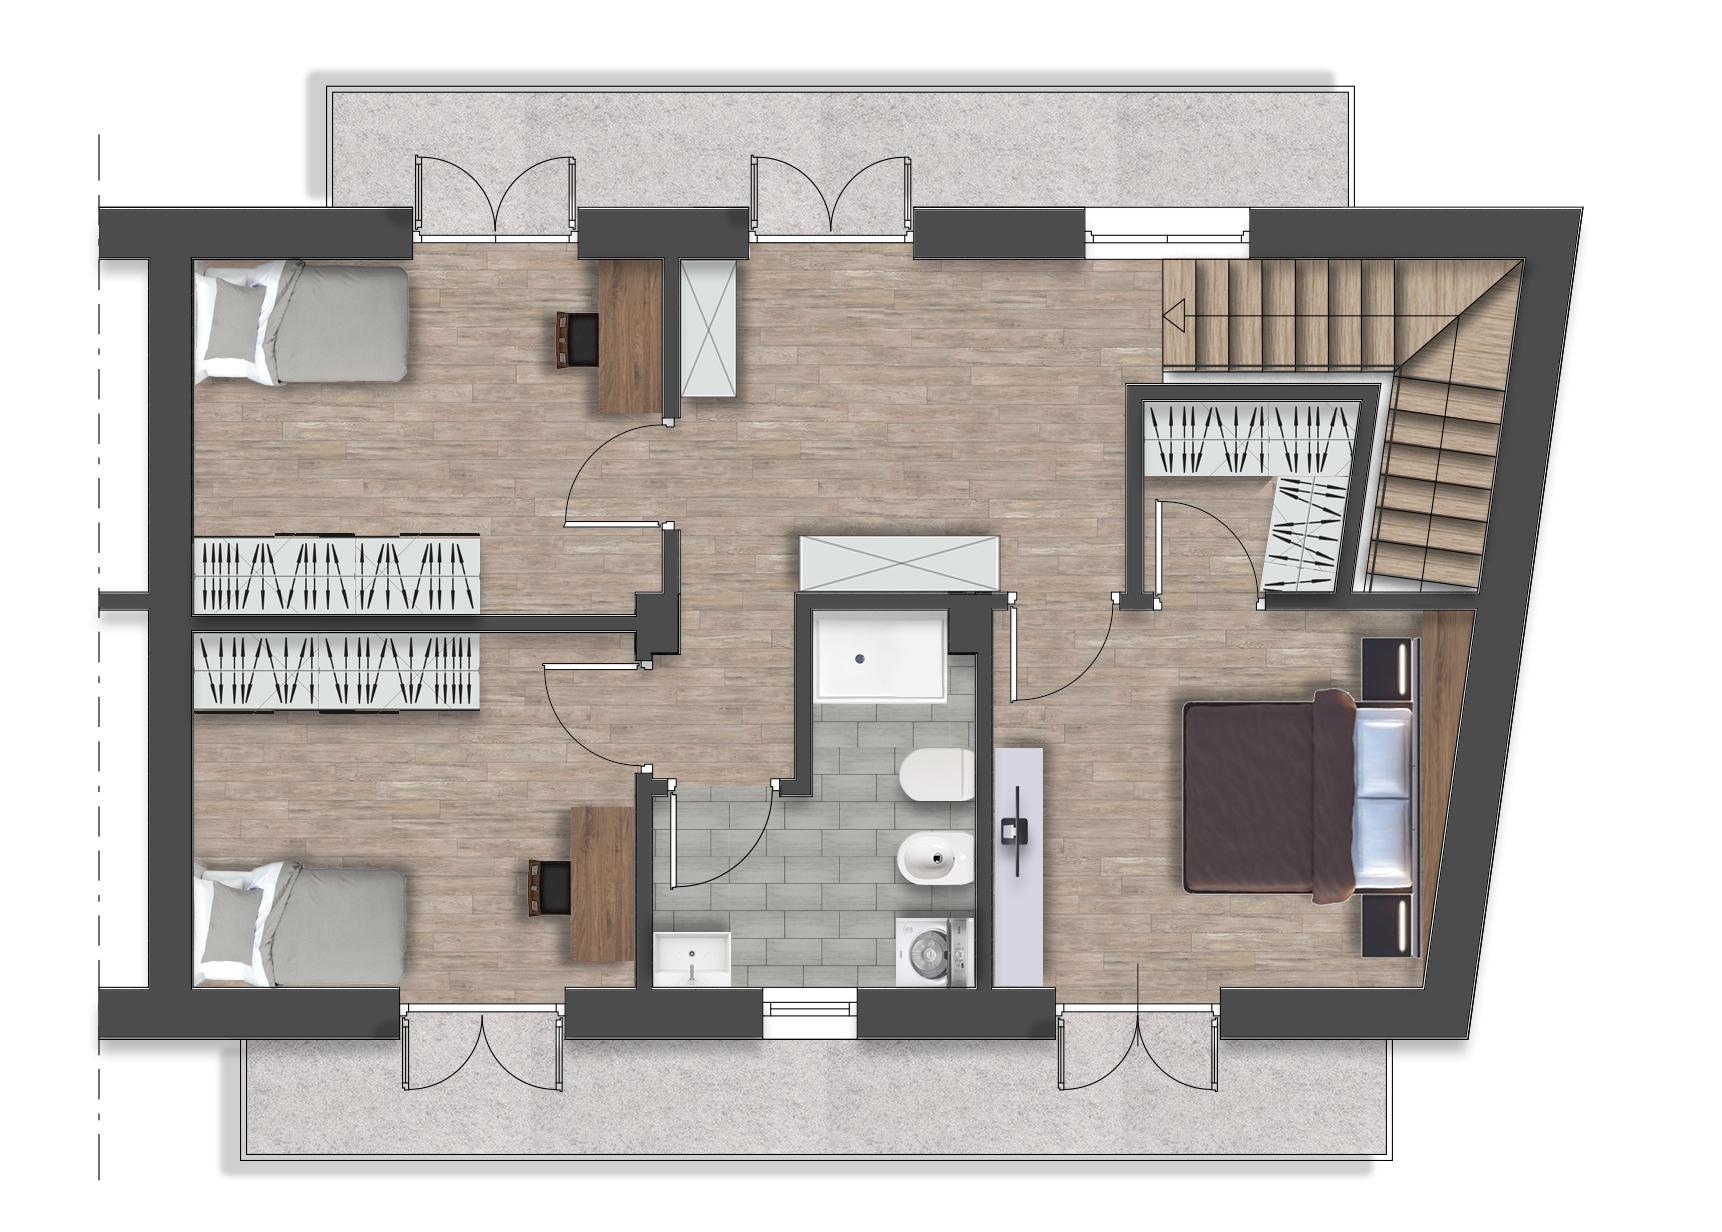 Luserna S.G. – Via Fuhrmann – Residenza Lavanda – Villetta 8